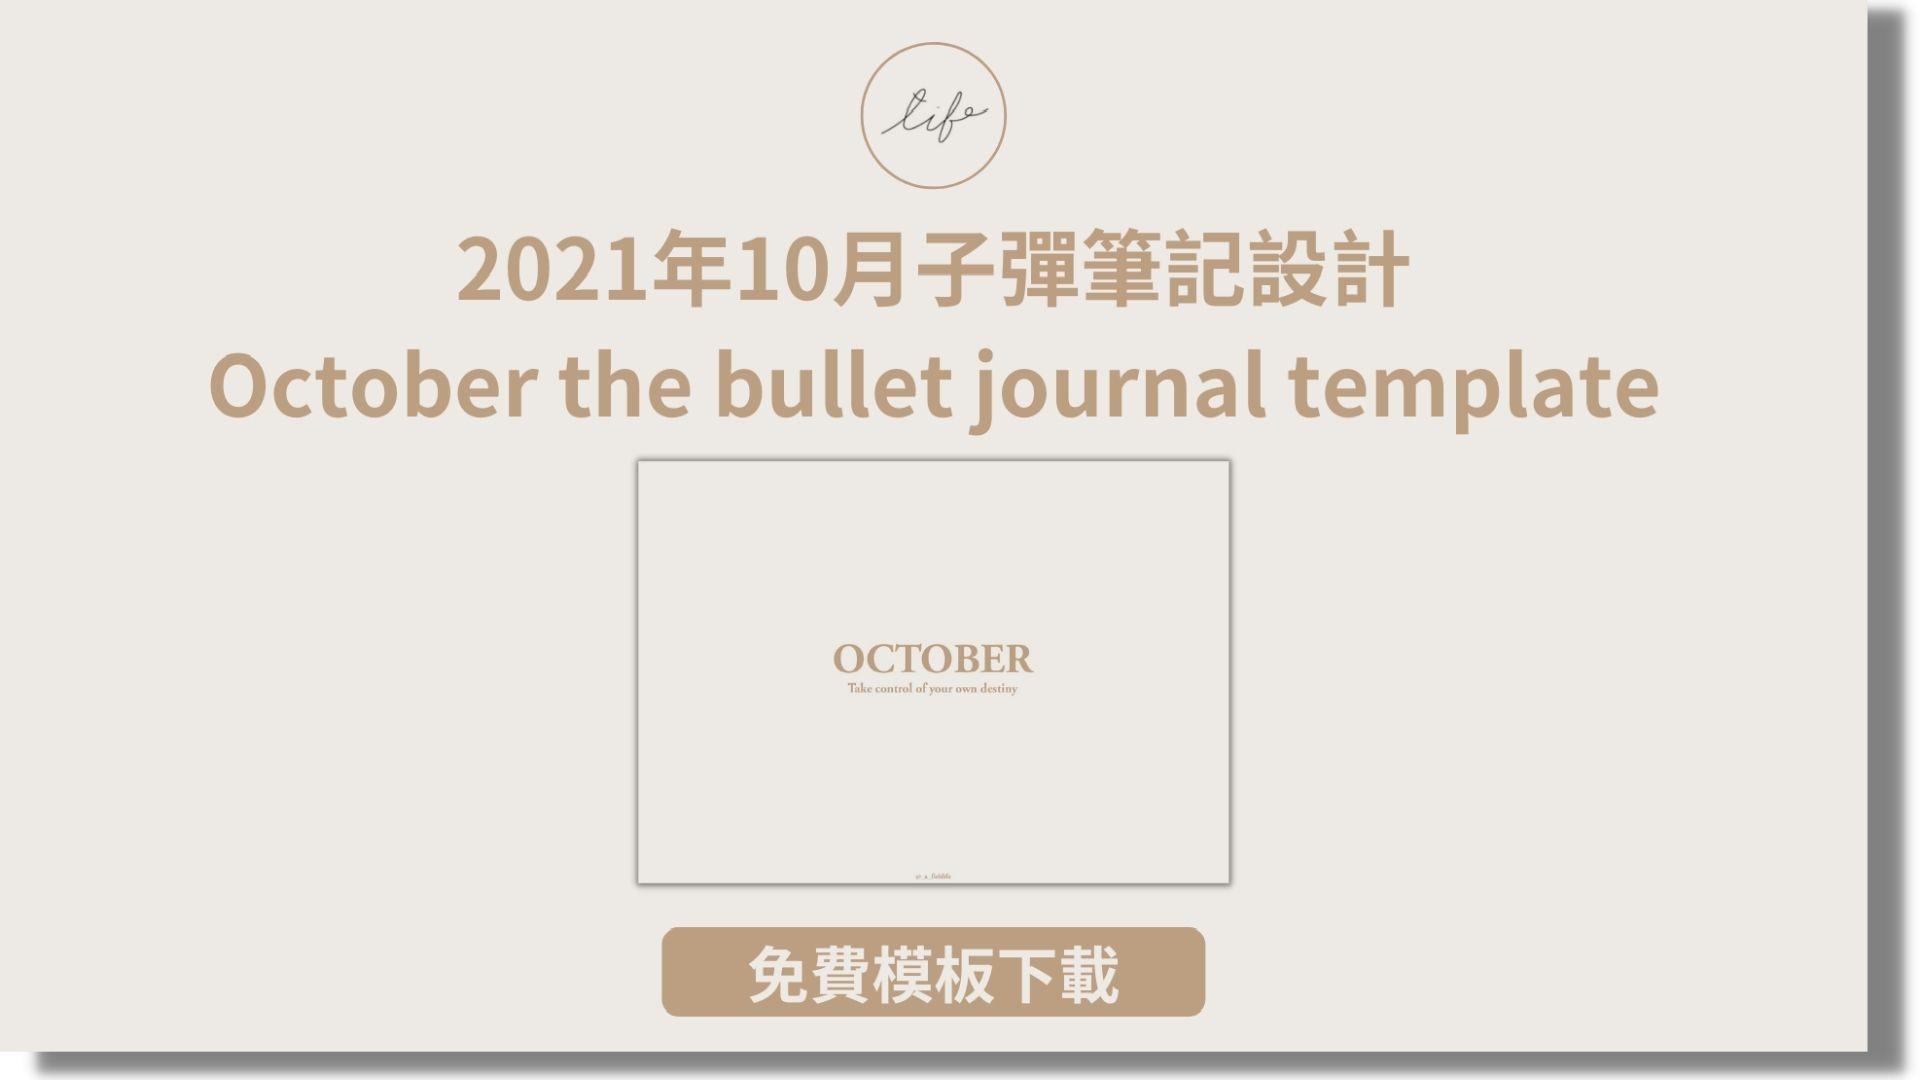 You are currently viewing 【免費下載】2021年10月子彈筆記設計,一隻魚品牌色設計|October bullet journal template